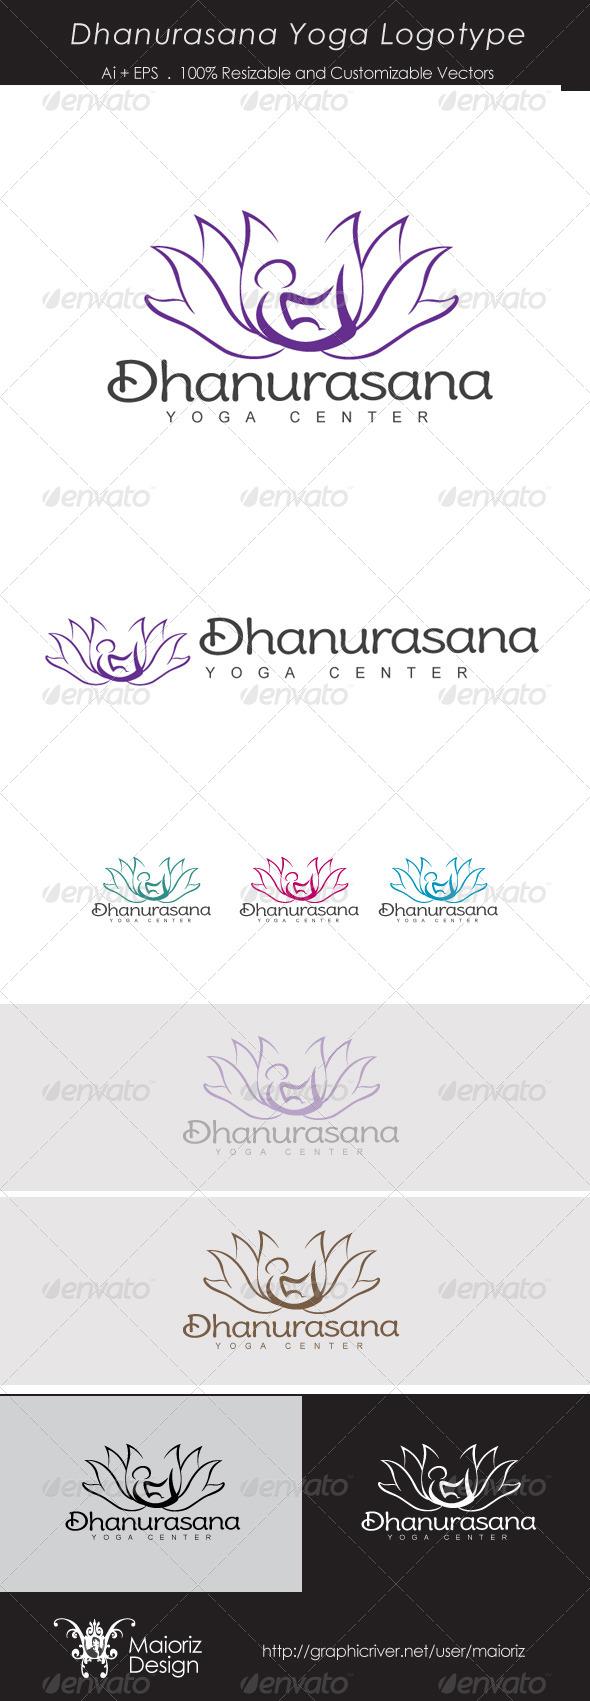 GraphicRiver Dhanurasana Yoga Logo 4069169